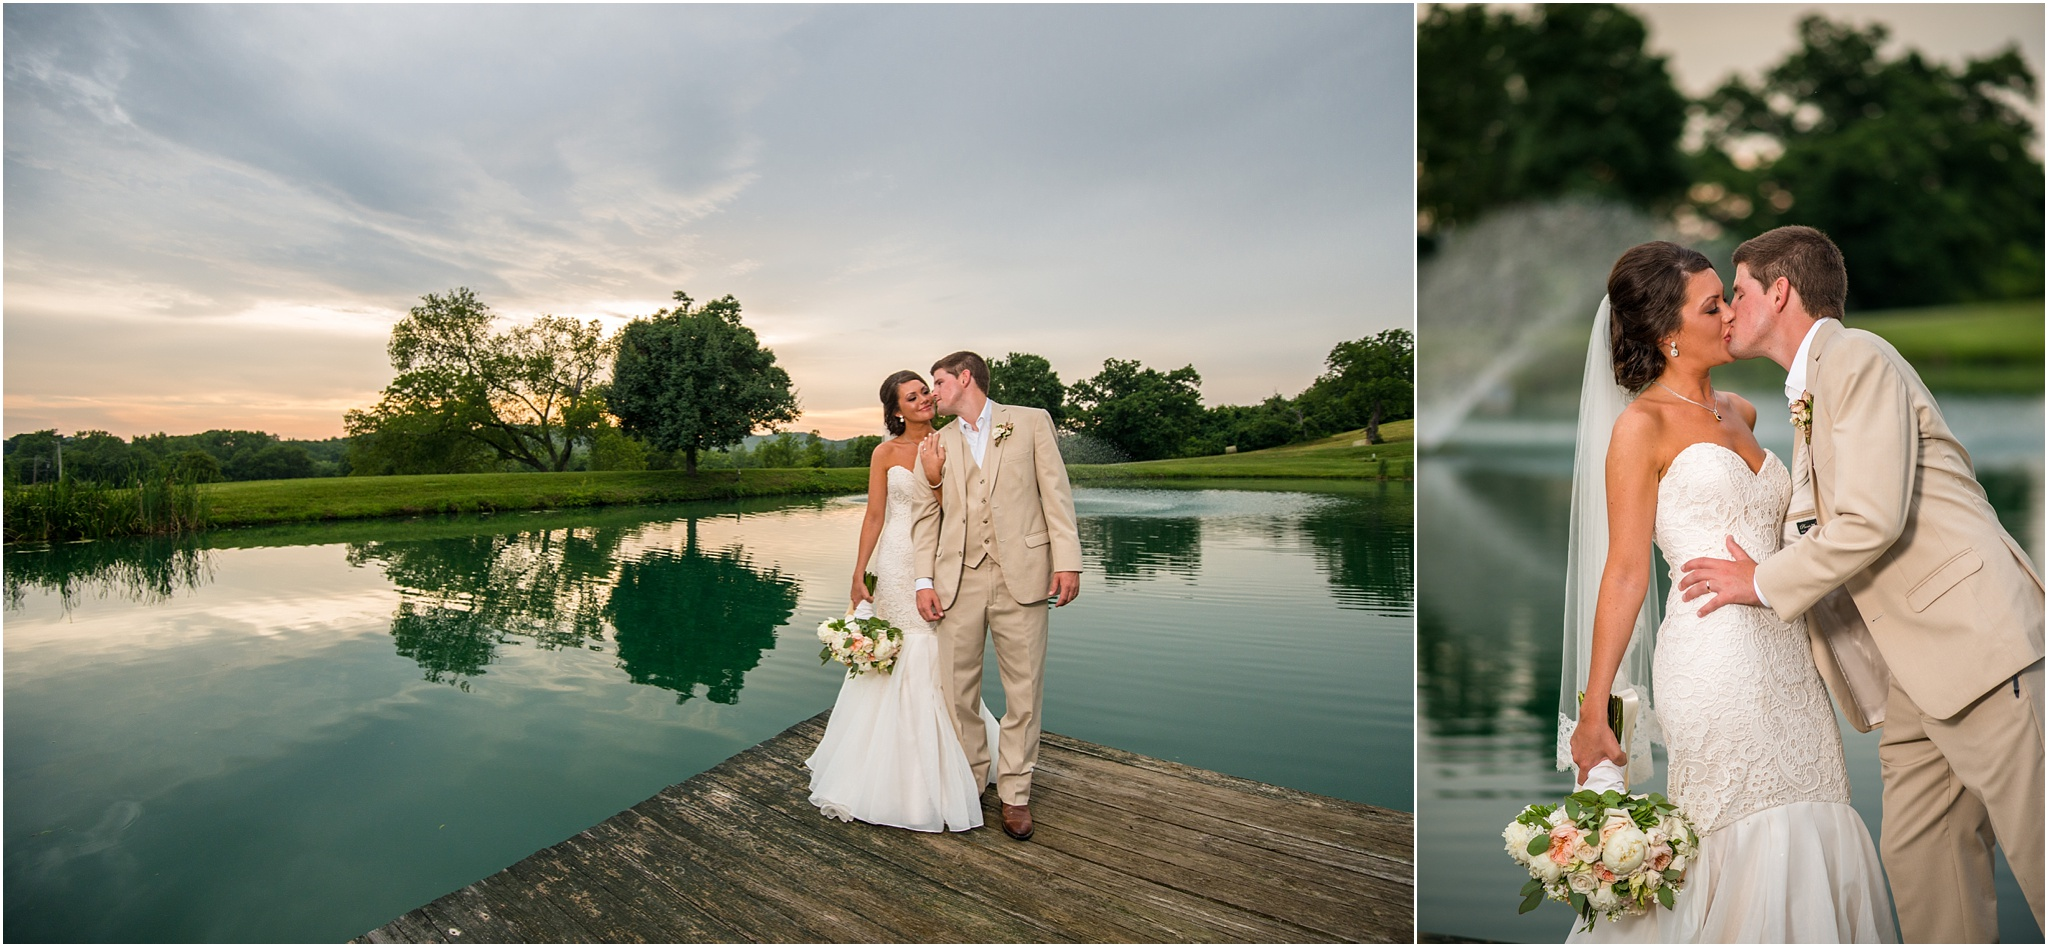 Greg Smit Photography Nashville wedding photographer Mint Springs Farm 21